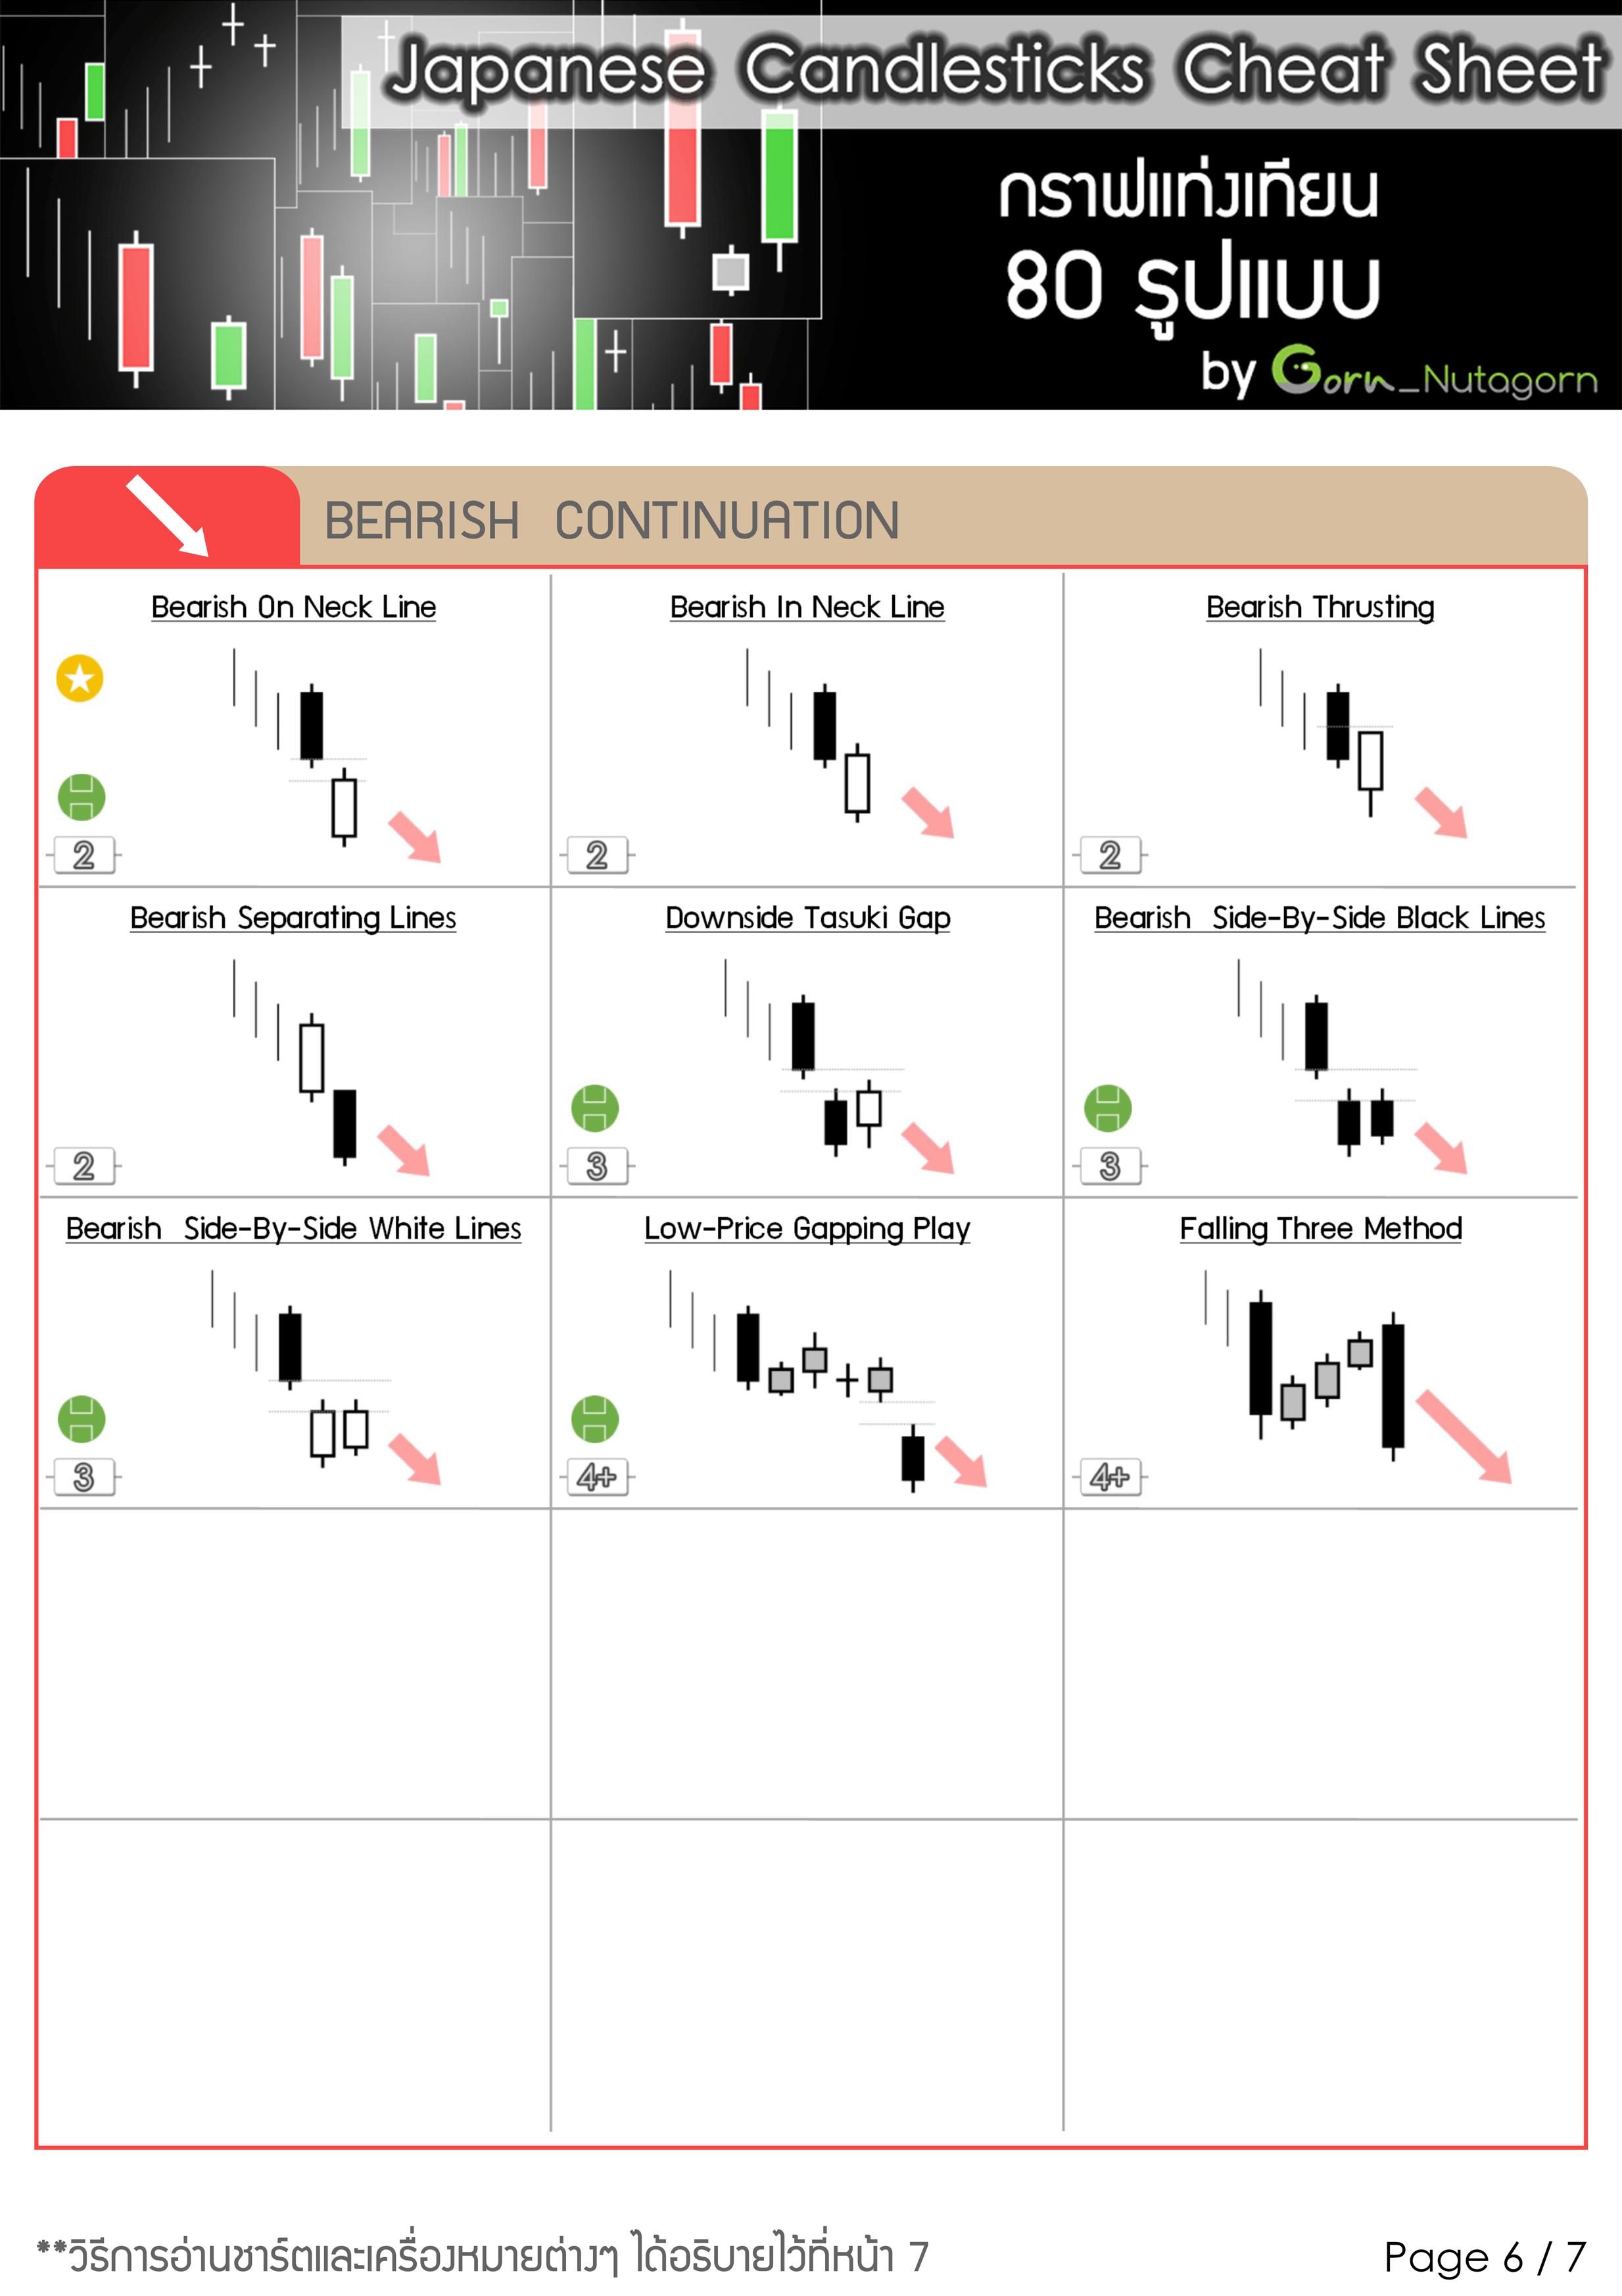 Japanese-Candlestick-Cheat-Sheet-กราฟแท่งเทียน-80-รูปแบบ-6